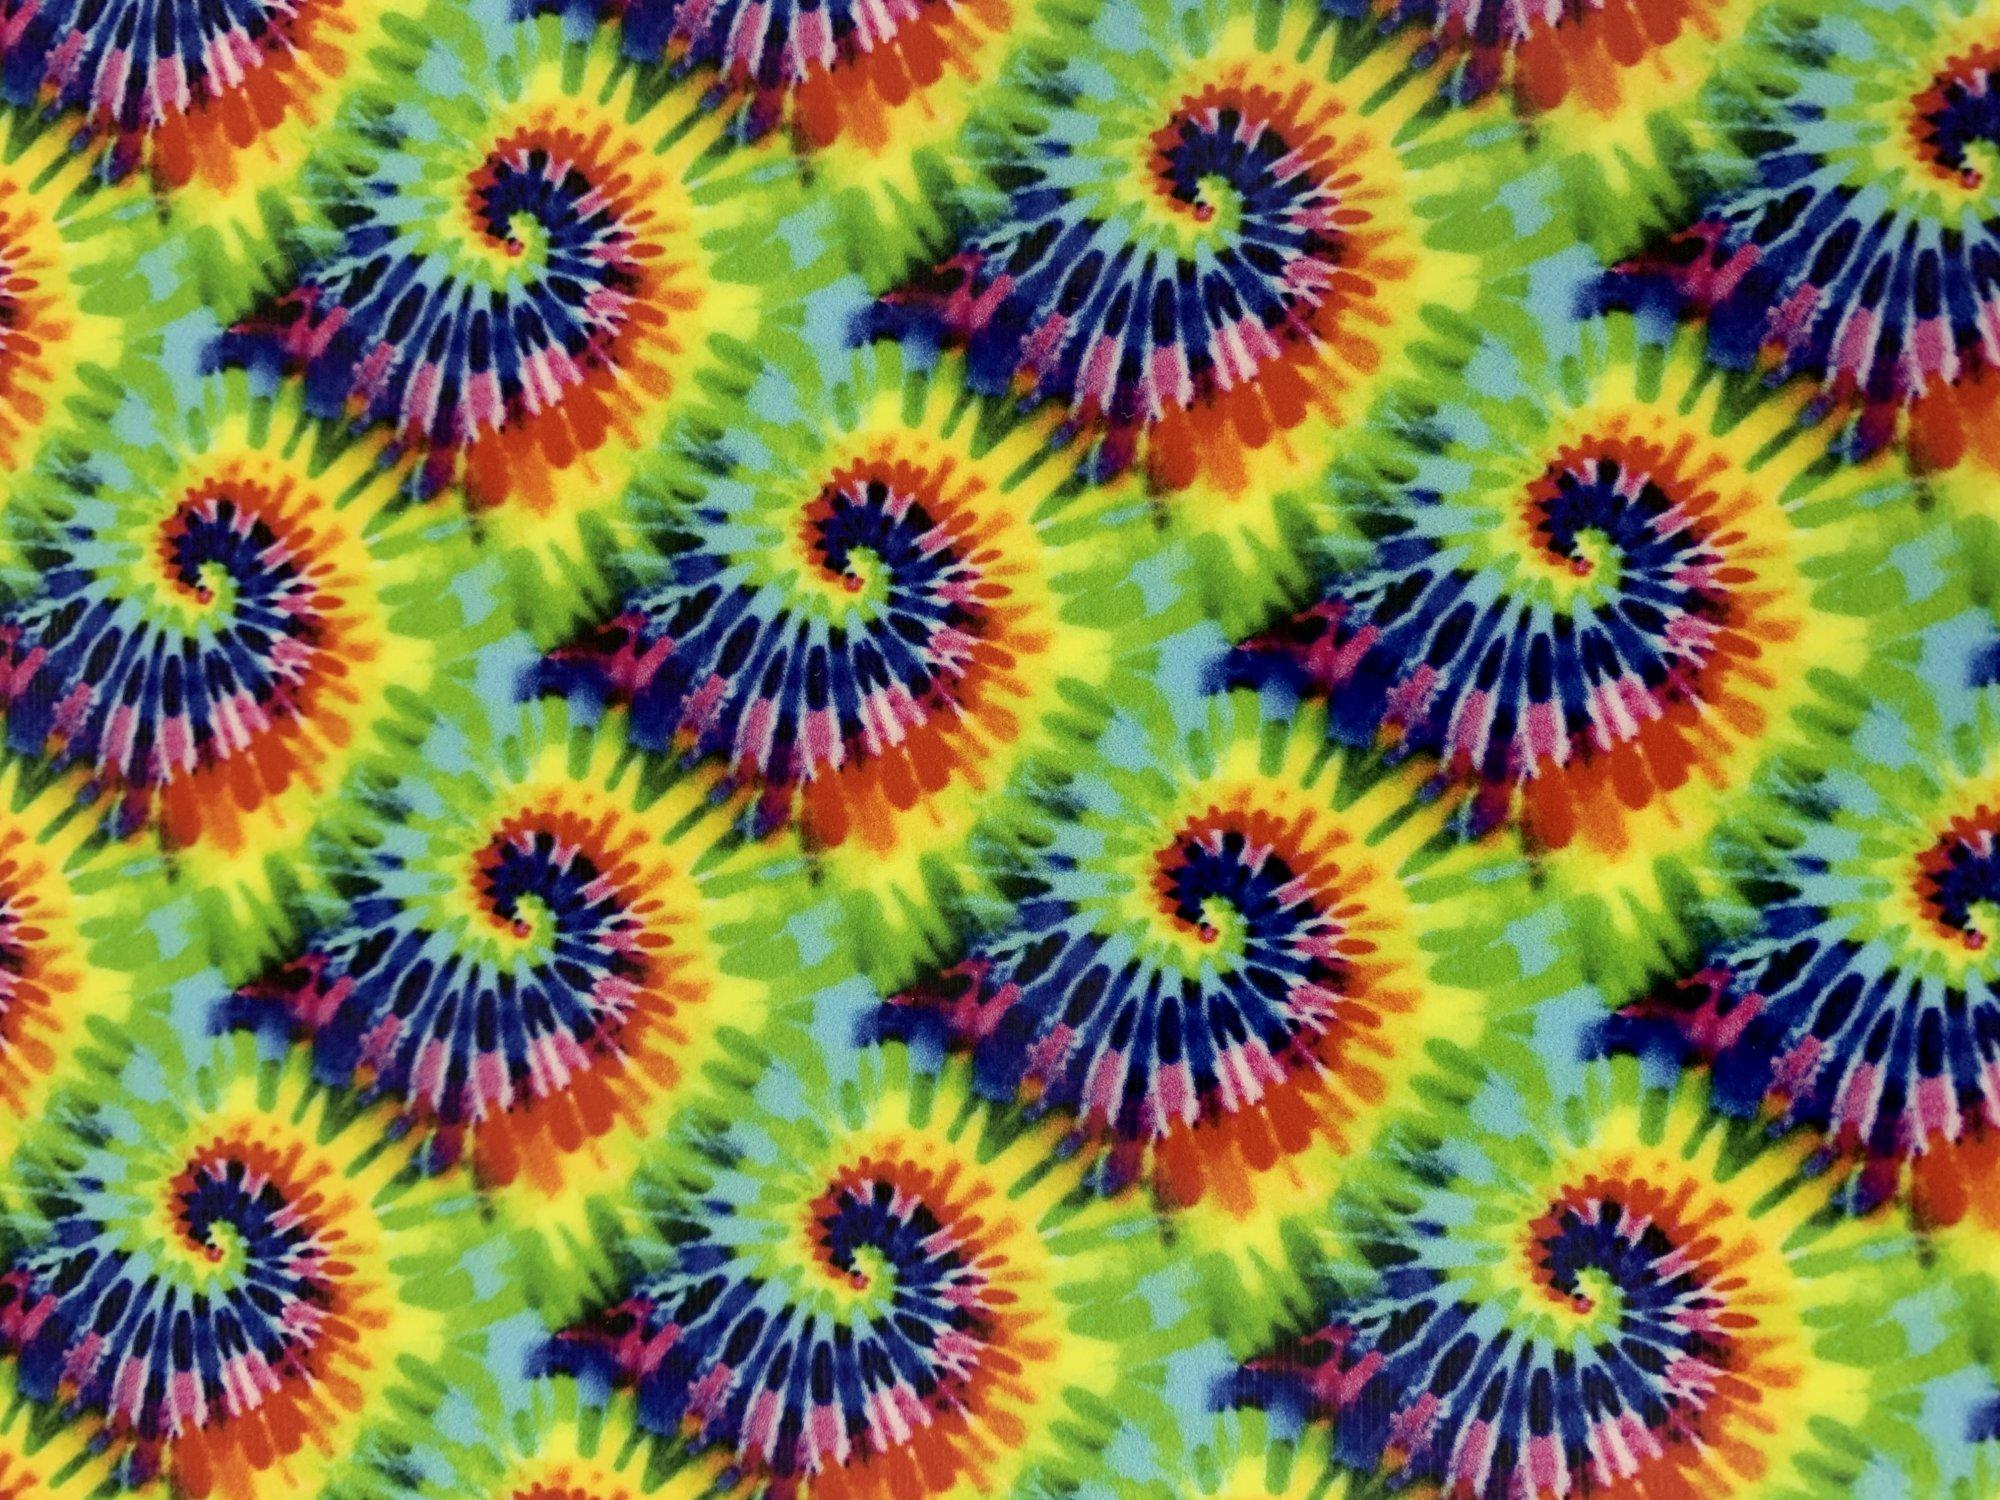 HTV Small Tye Dye Vinyl 1 yd